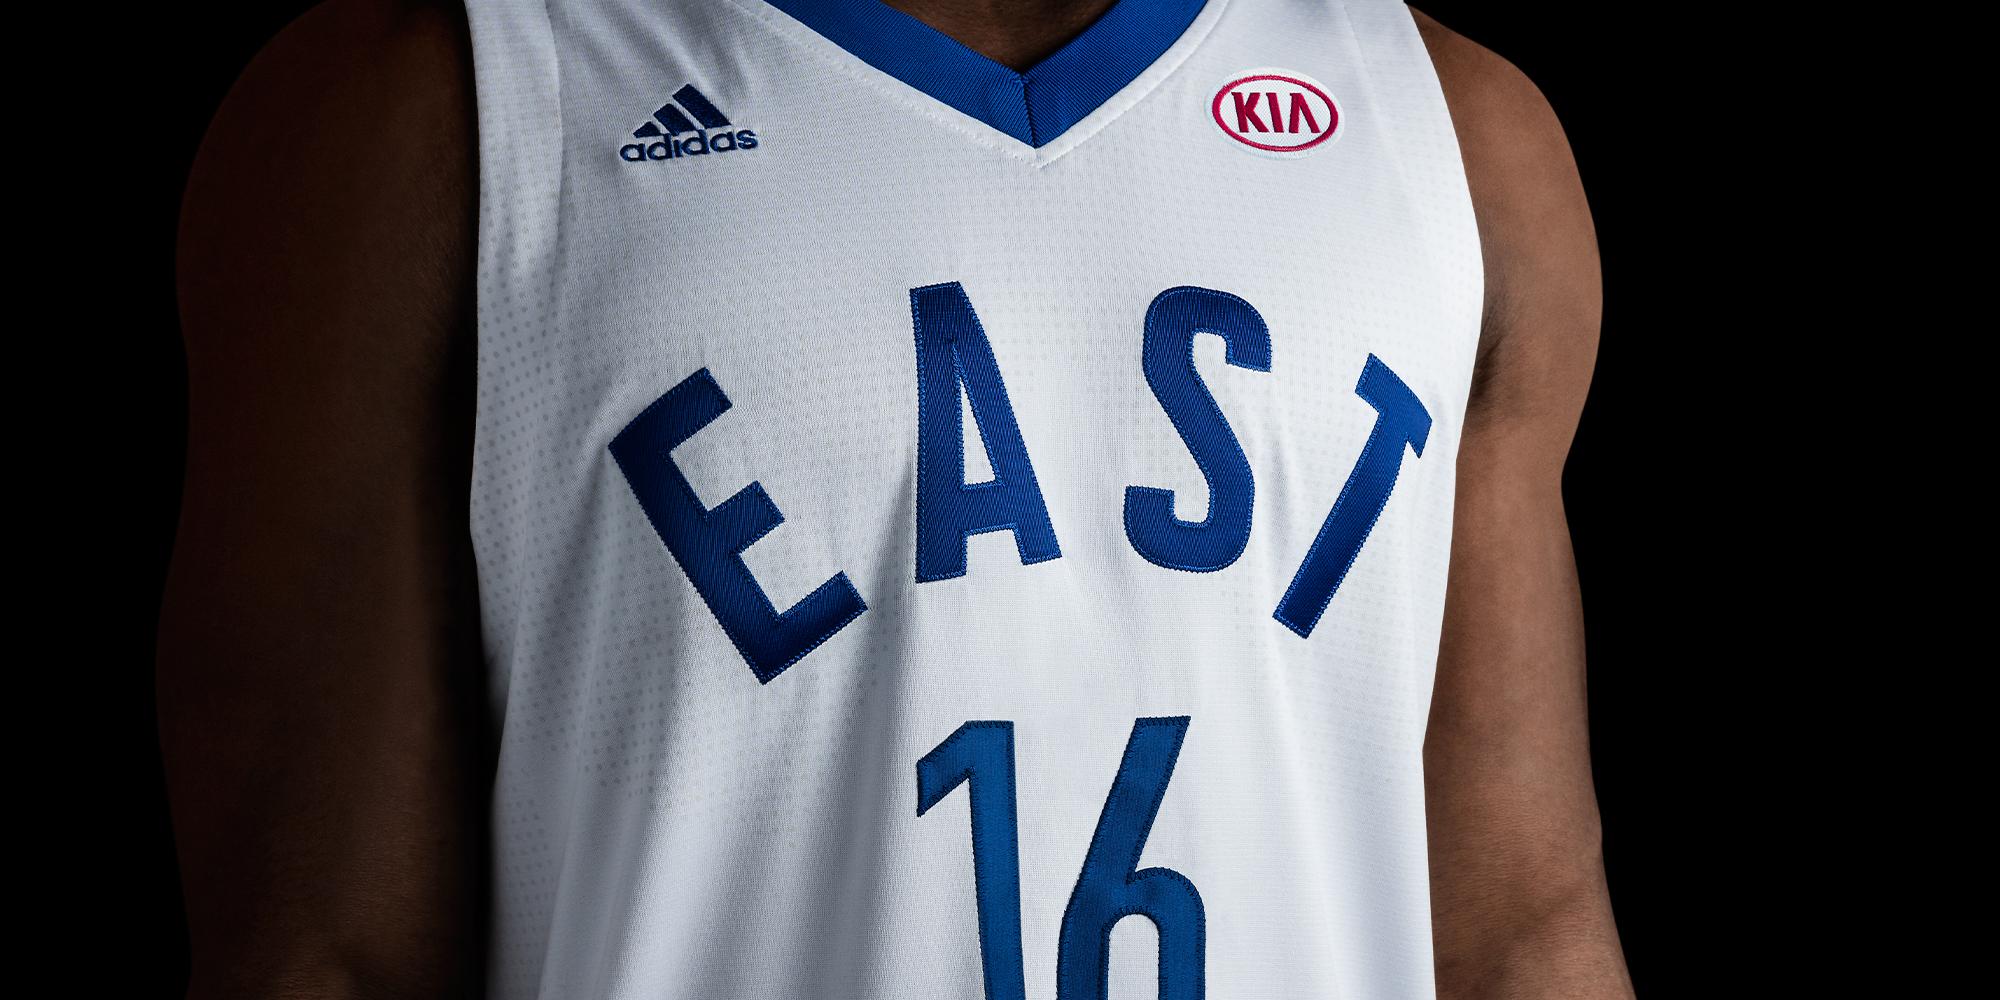 Kia adidas-NBA All-Star game 2016 toronto East Jersey